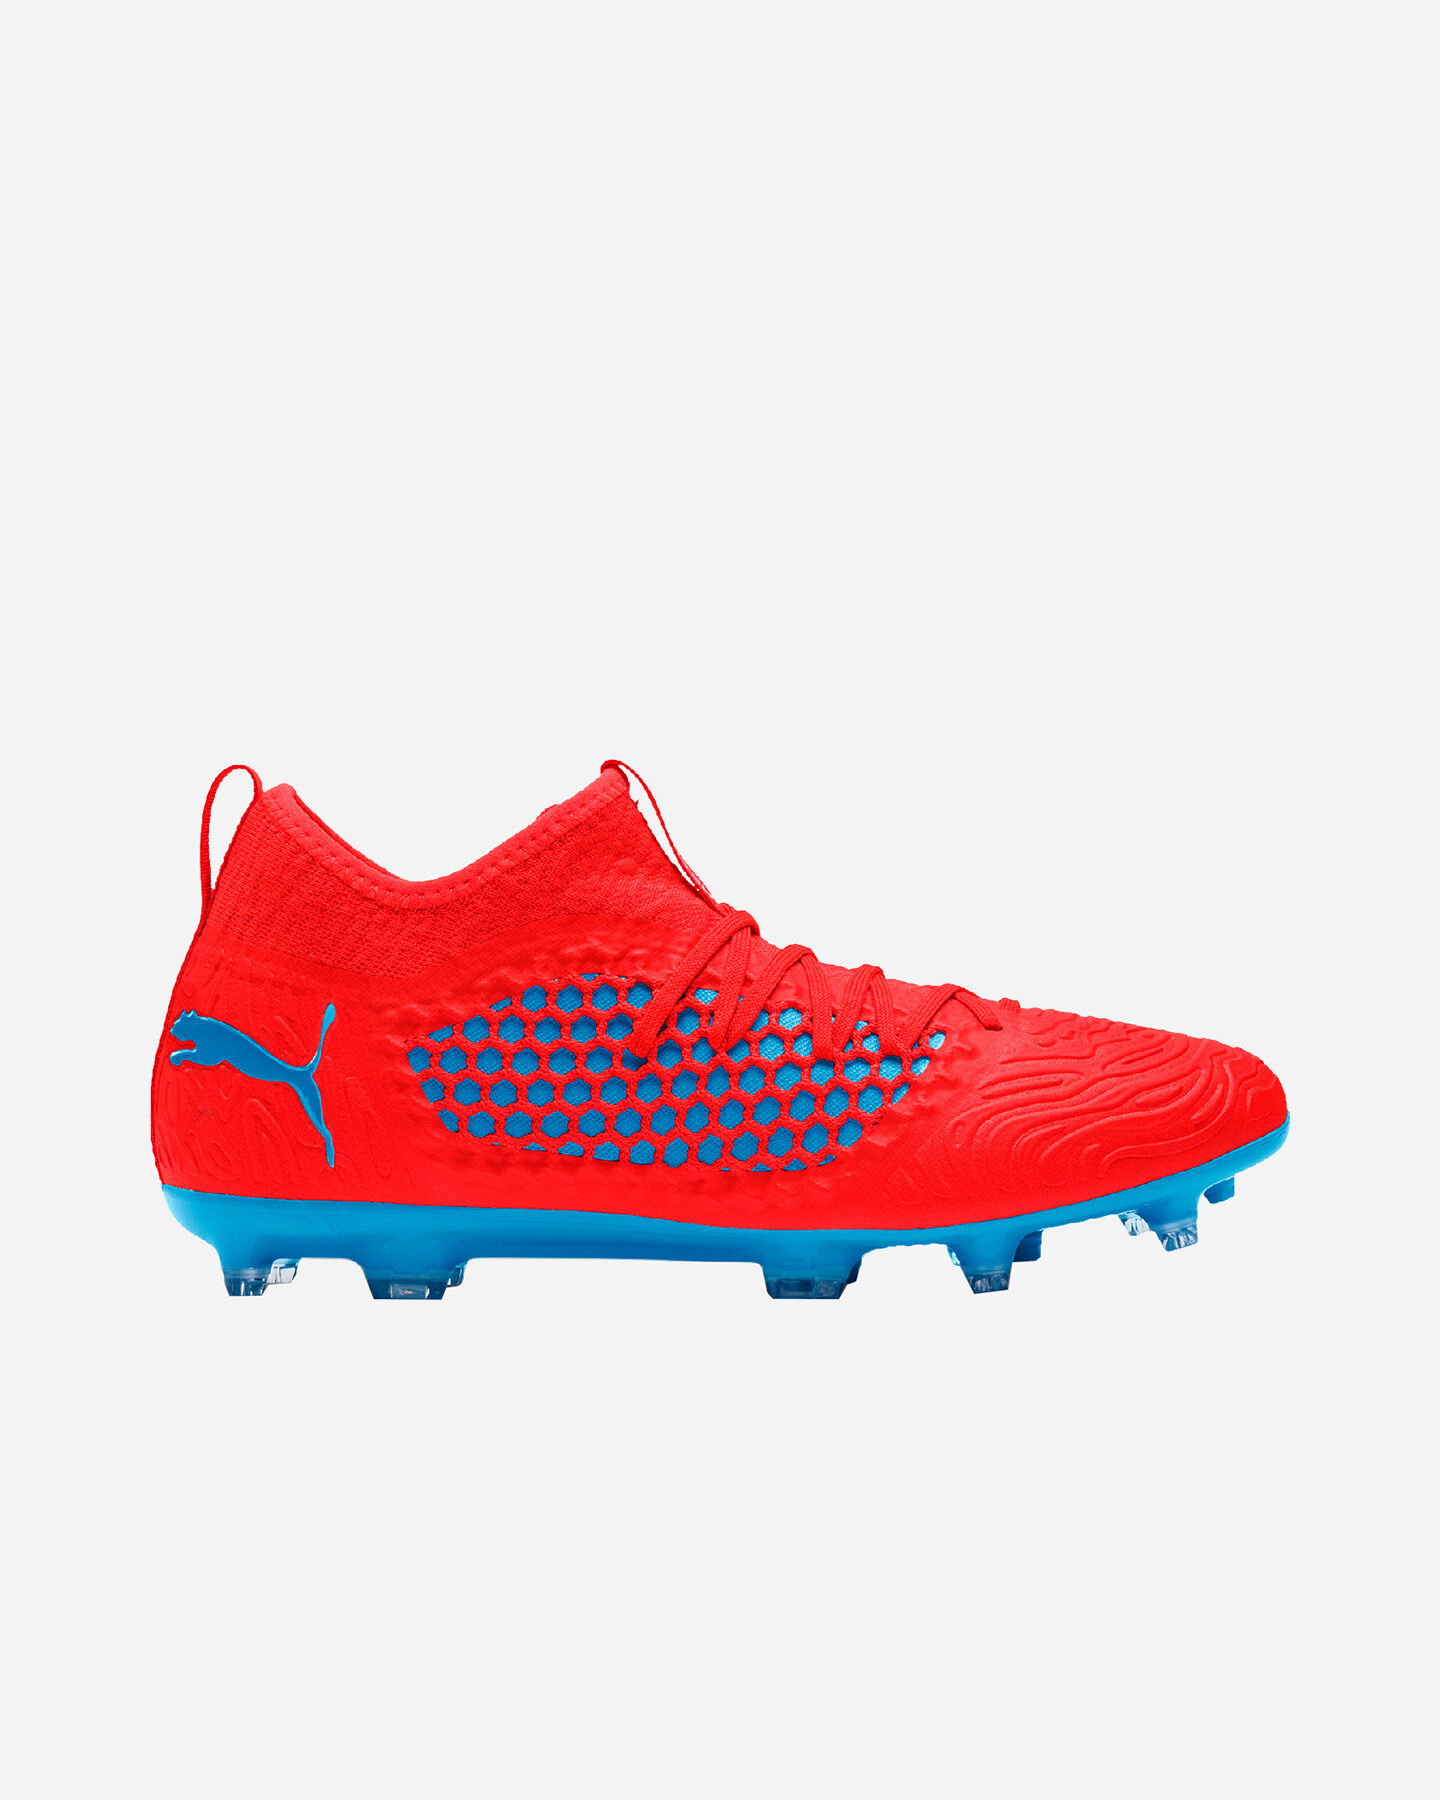 Calcio 19 Puma 3 Scarpe 10553901 Cisalfa Su Future Netfit Sport M r0w1qr5